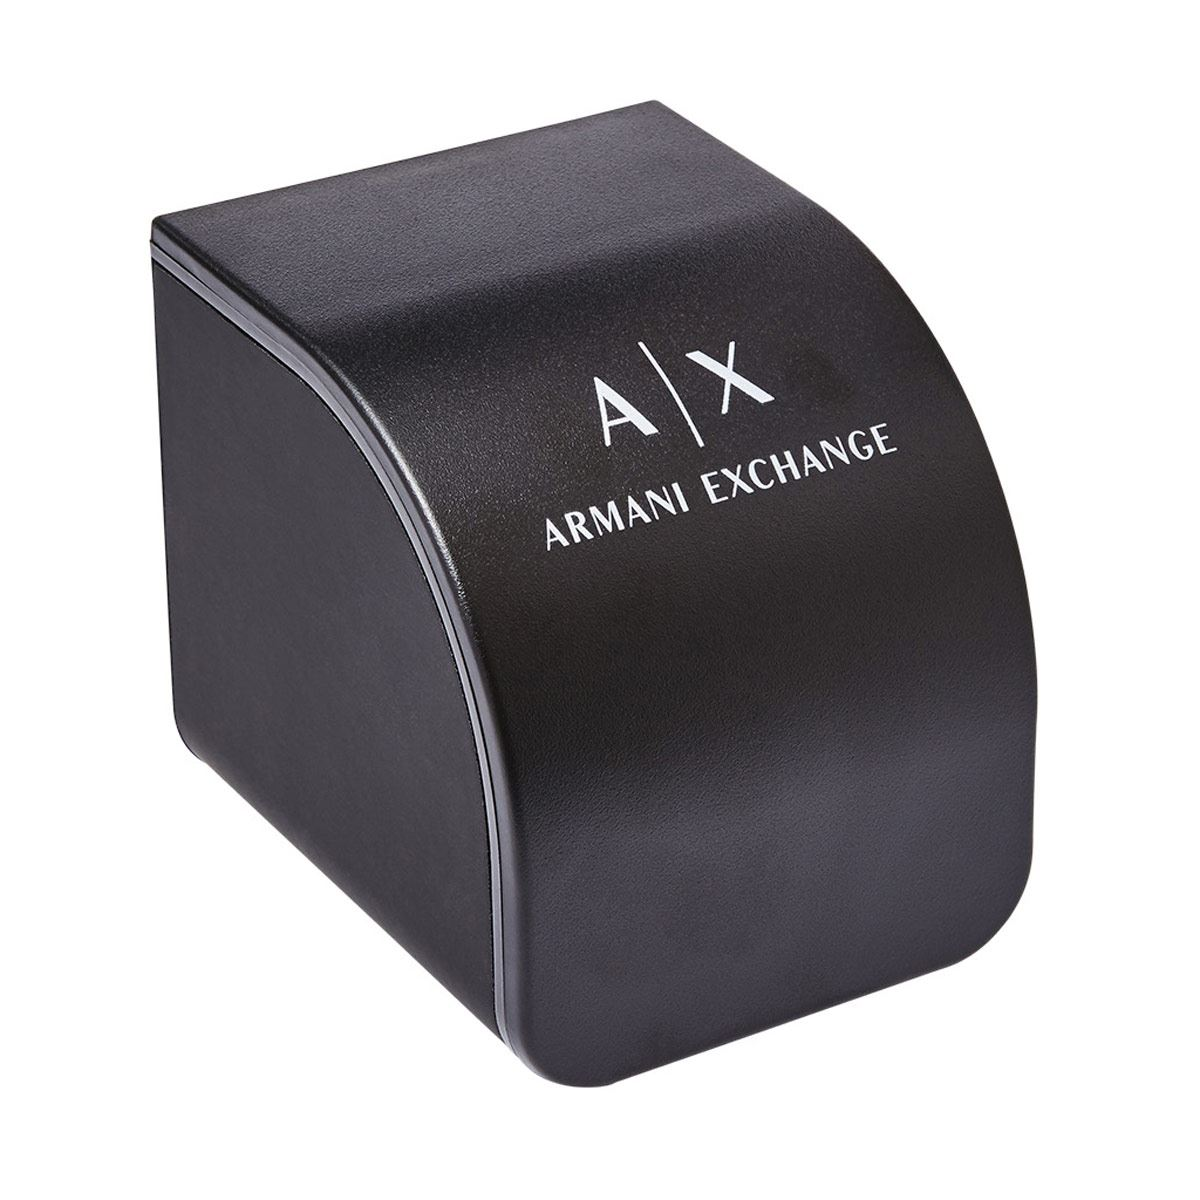 Reloj Armani Exchange Drexler Negro y Rojo Para Caballero